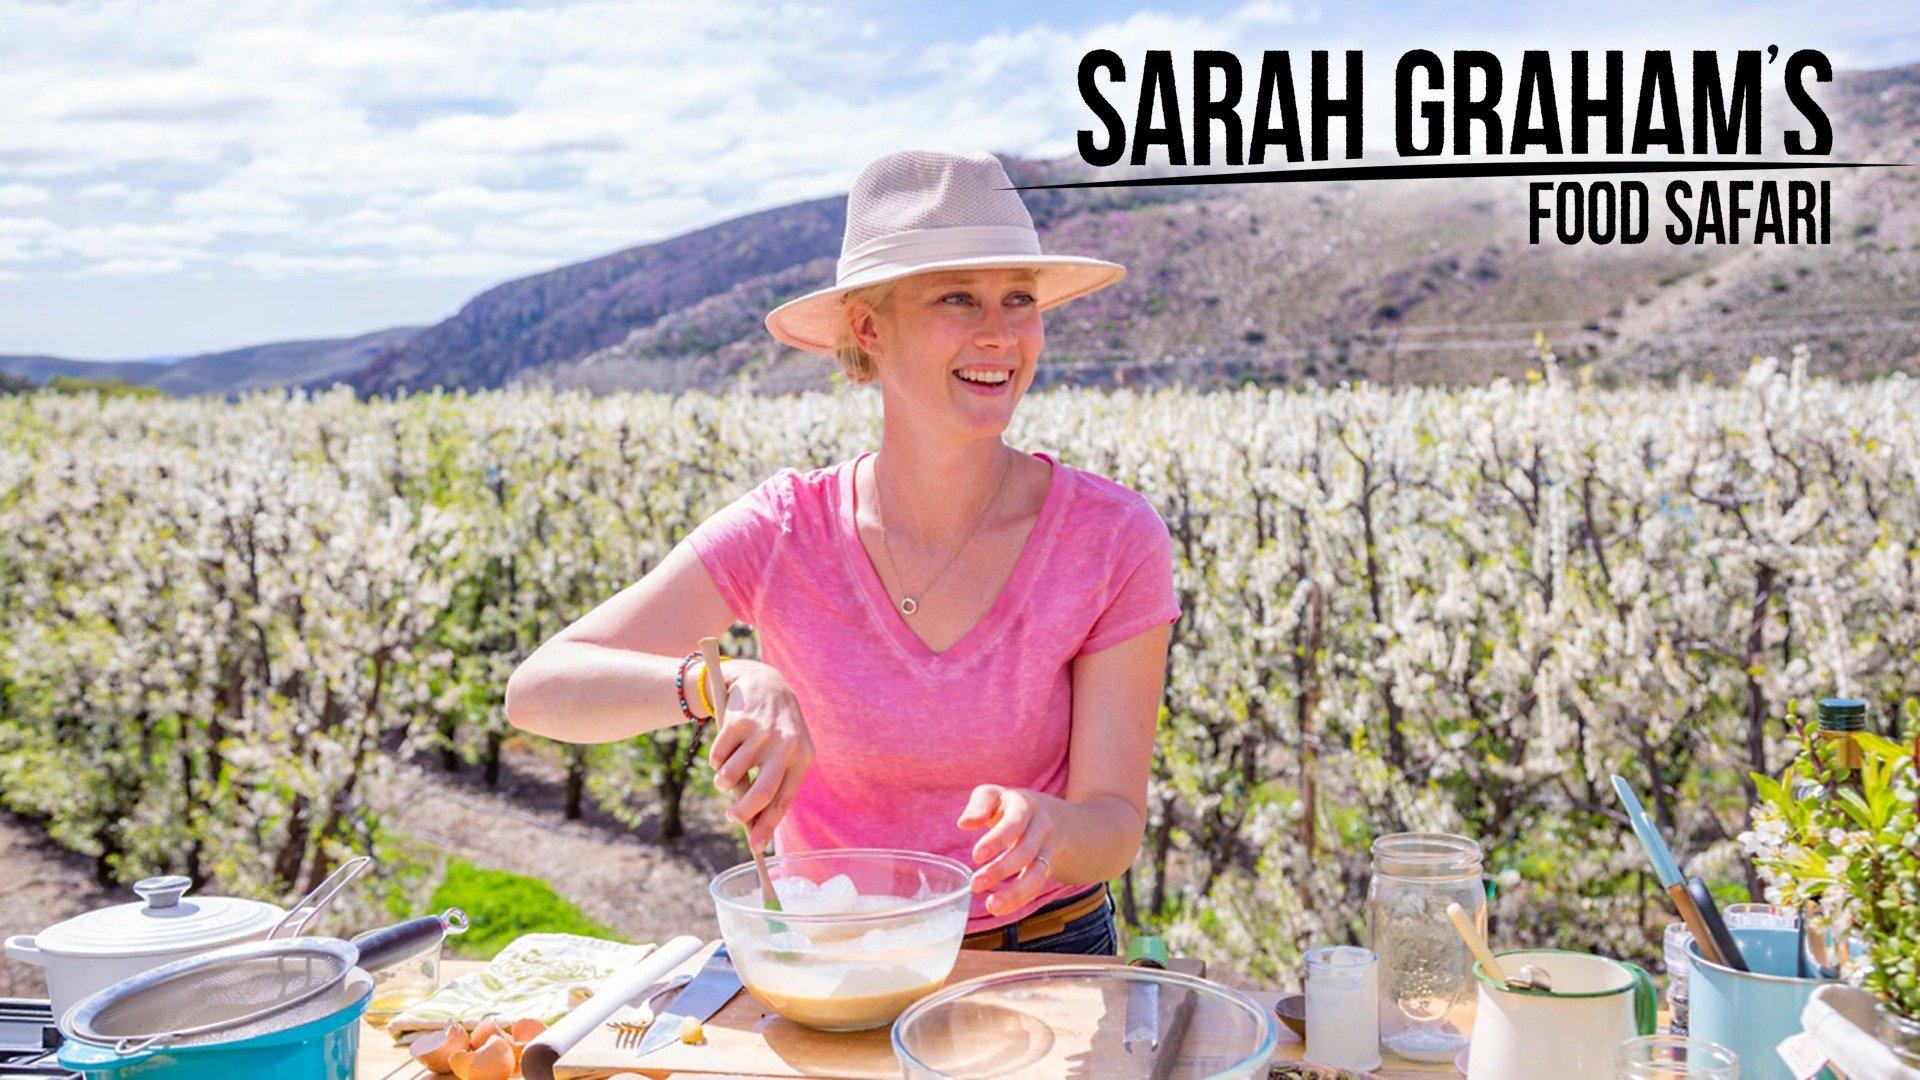 Sarah Graham's Food Safari